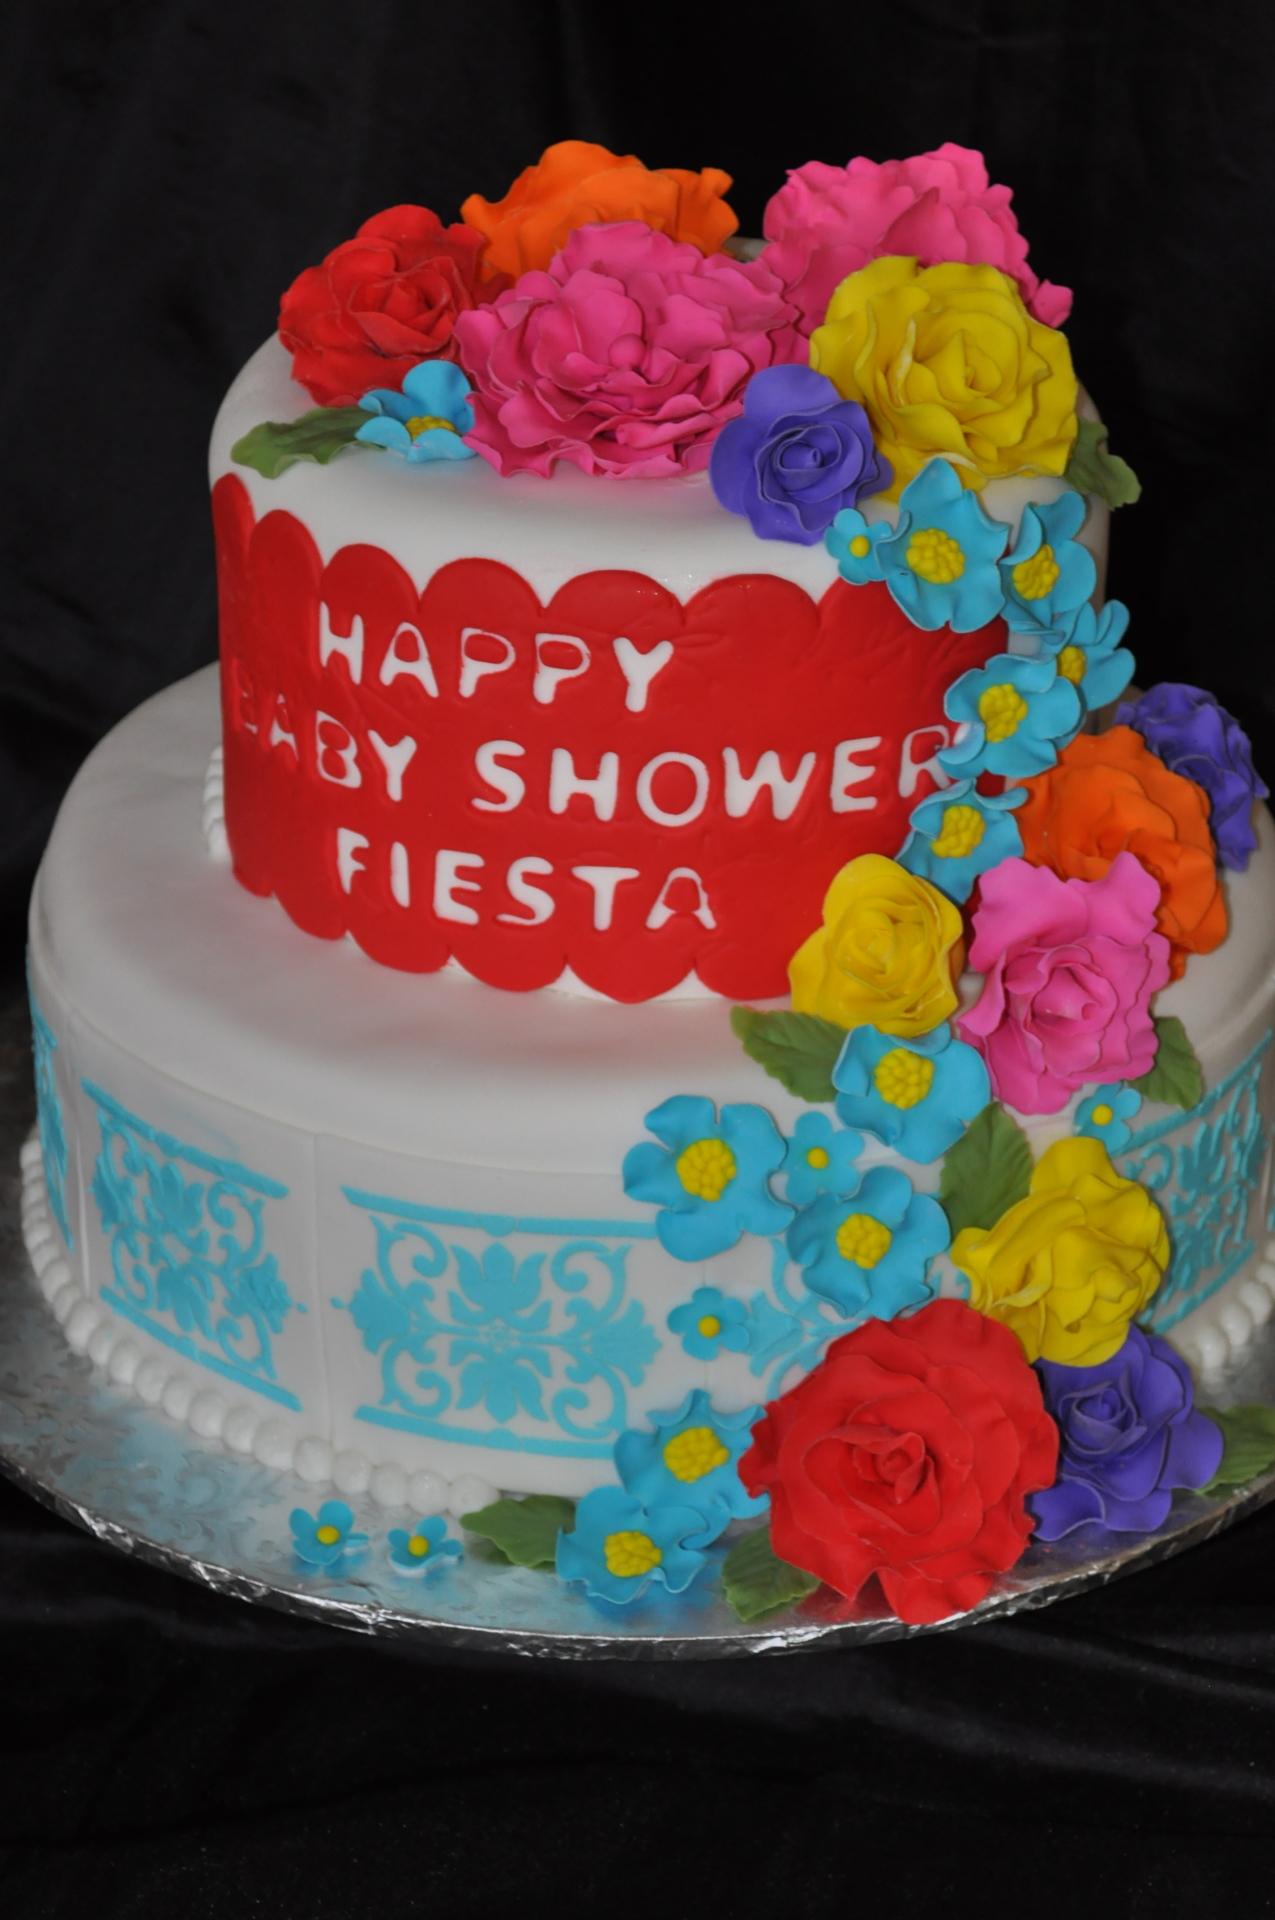 Fiesta baby shower cake,floral cake,tile cake